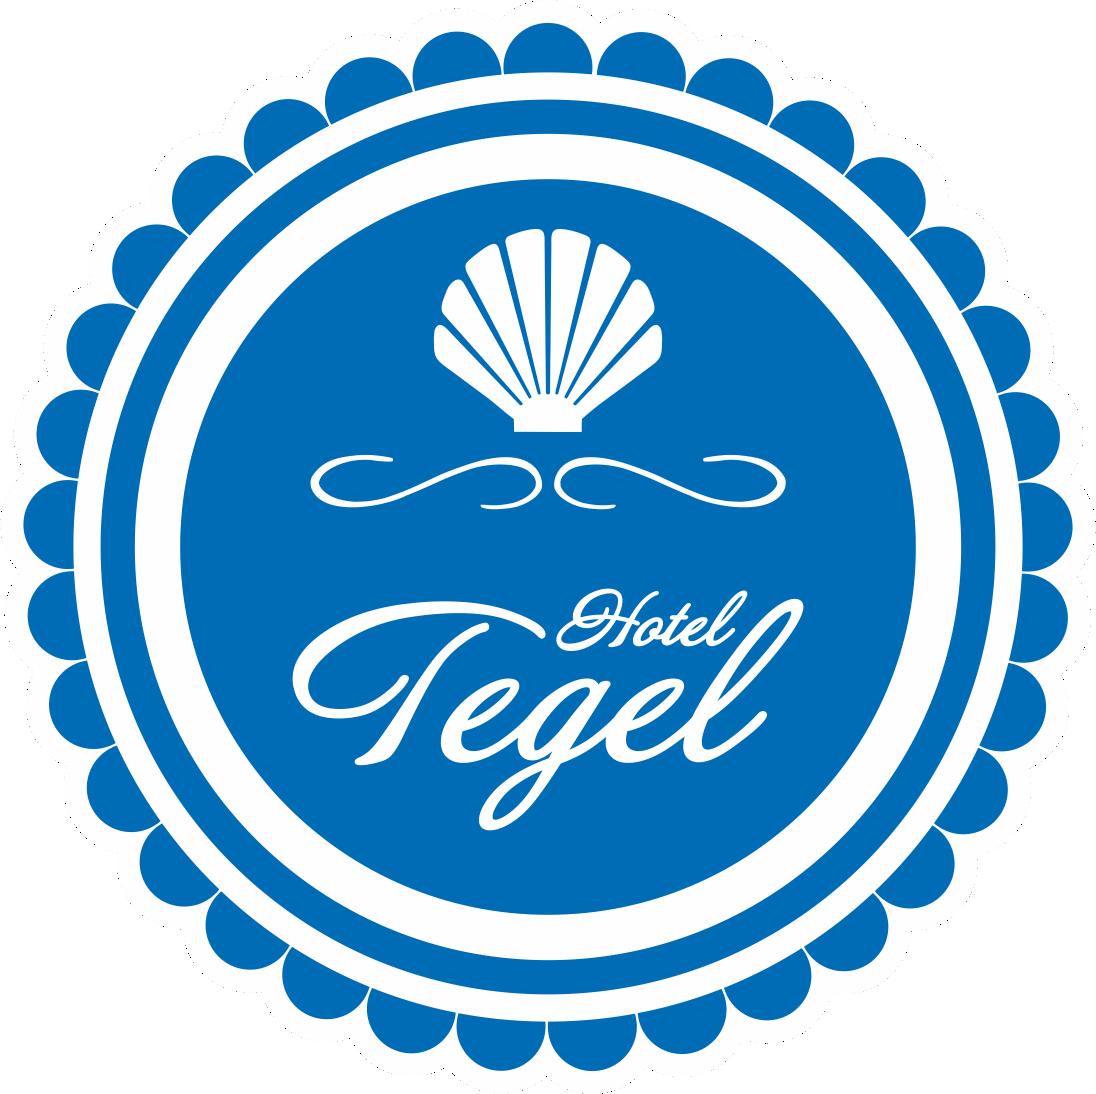 Hotel Tegel